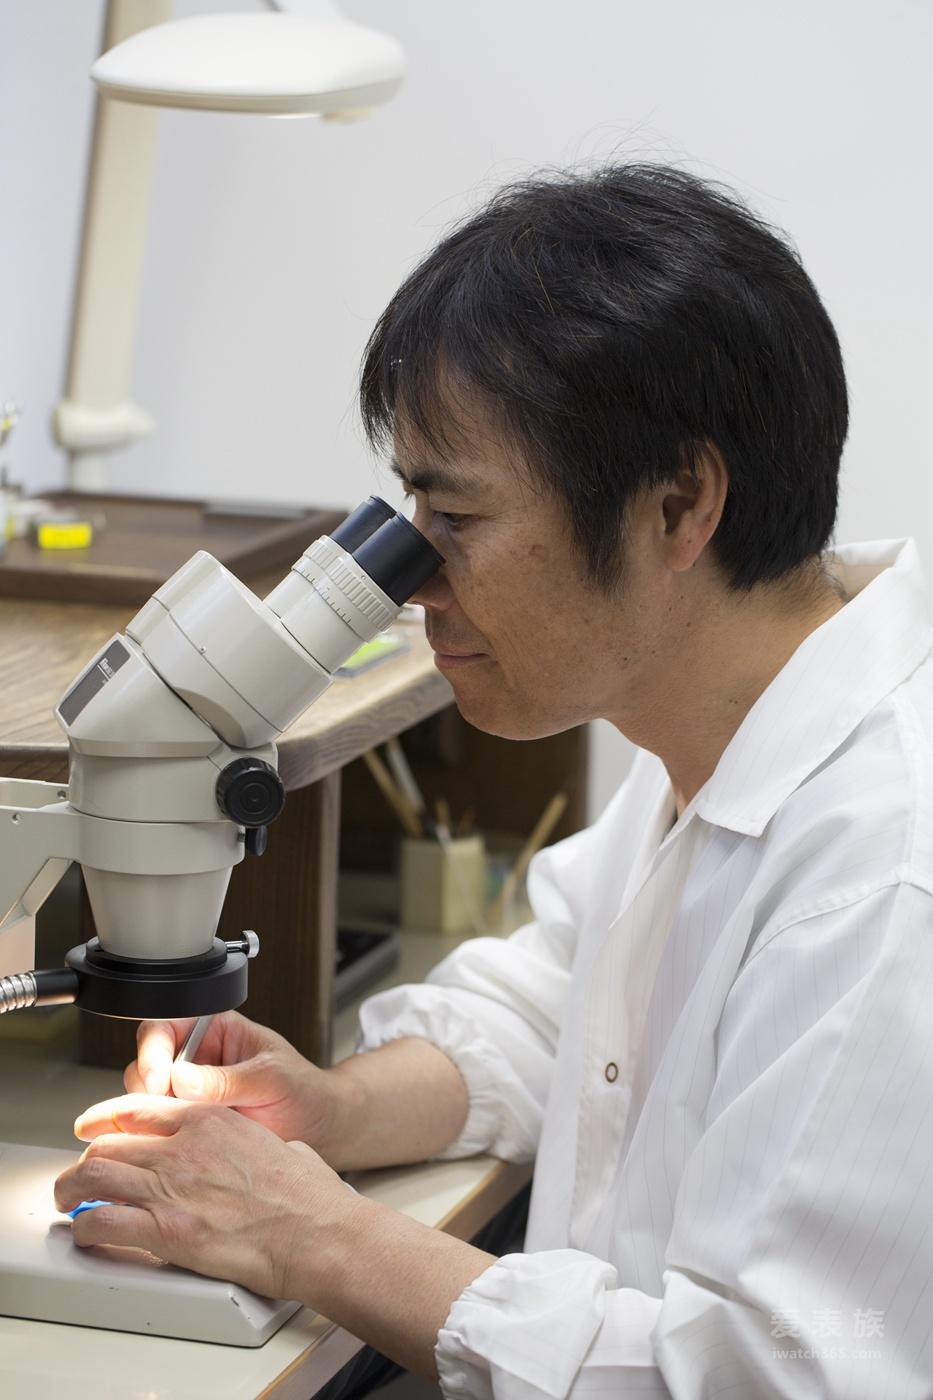 SEIKO(精工)日本制表工厂访问记【三】精工EPSON工厂